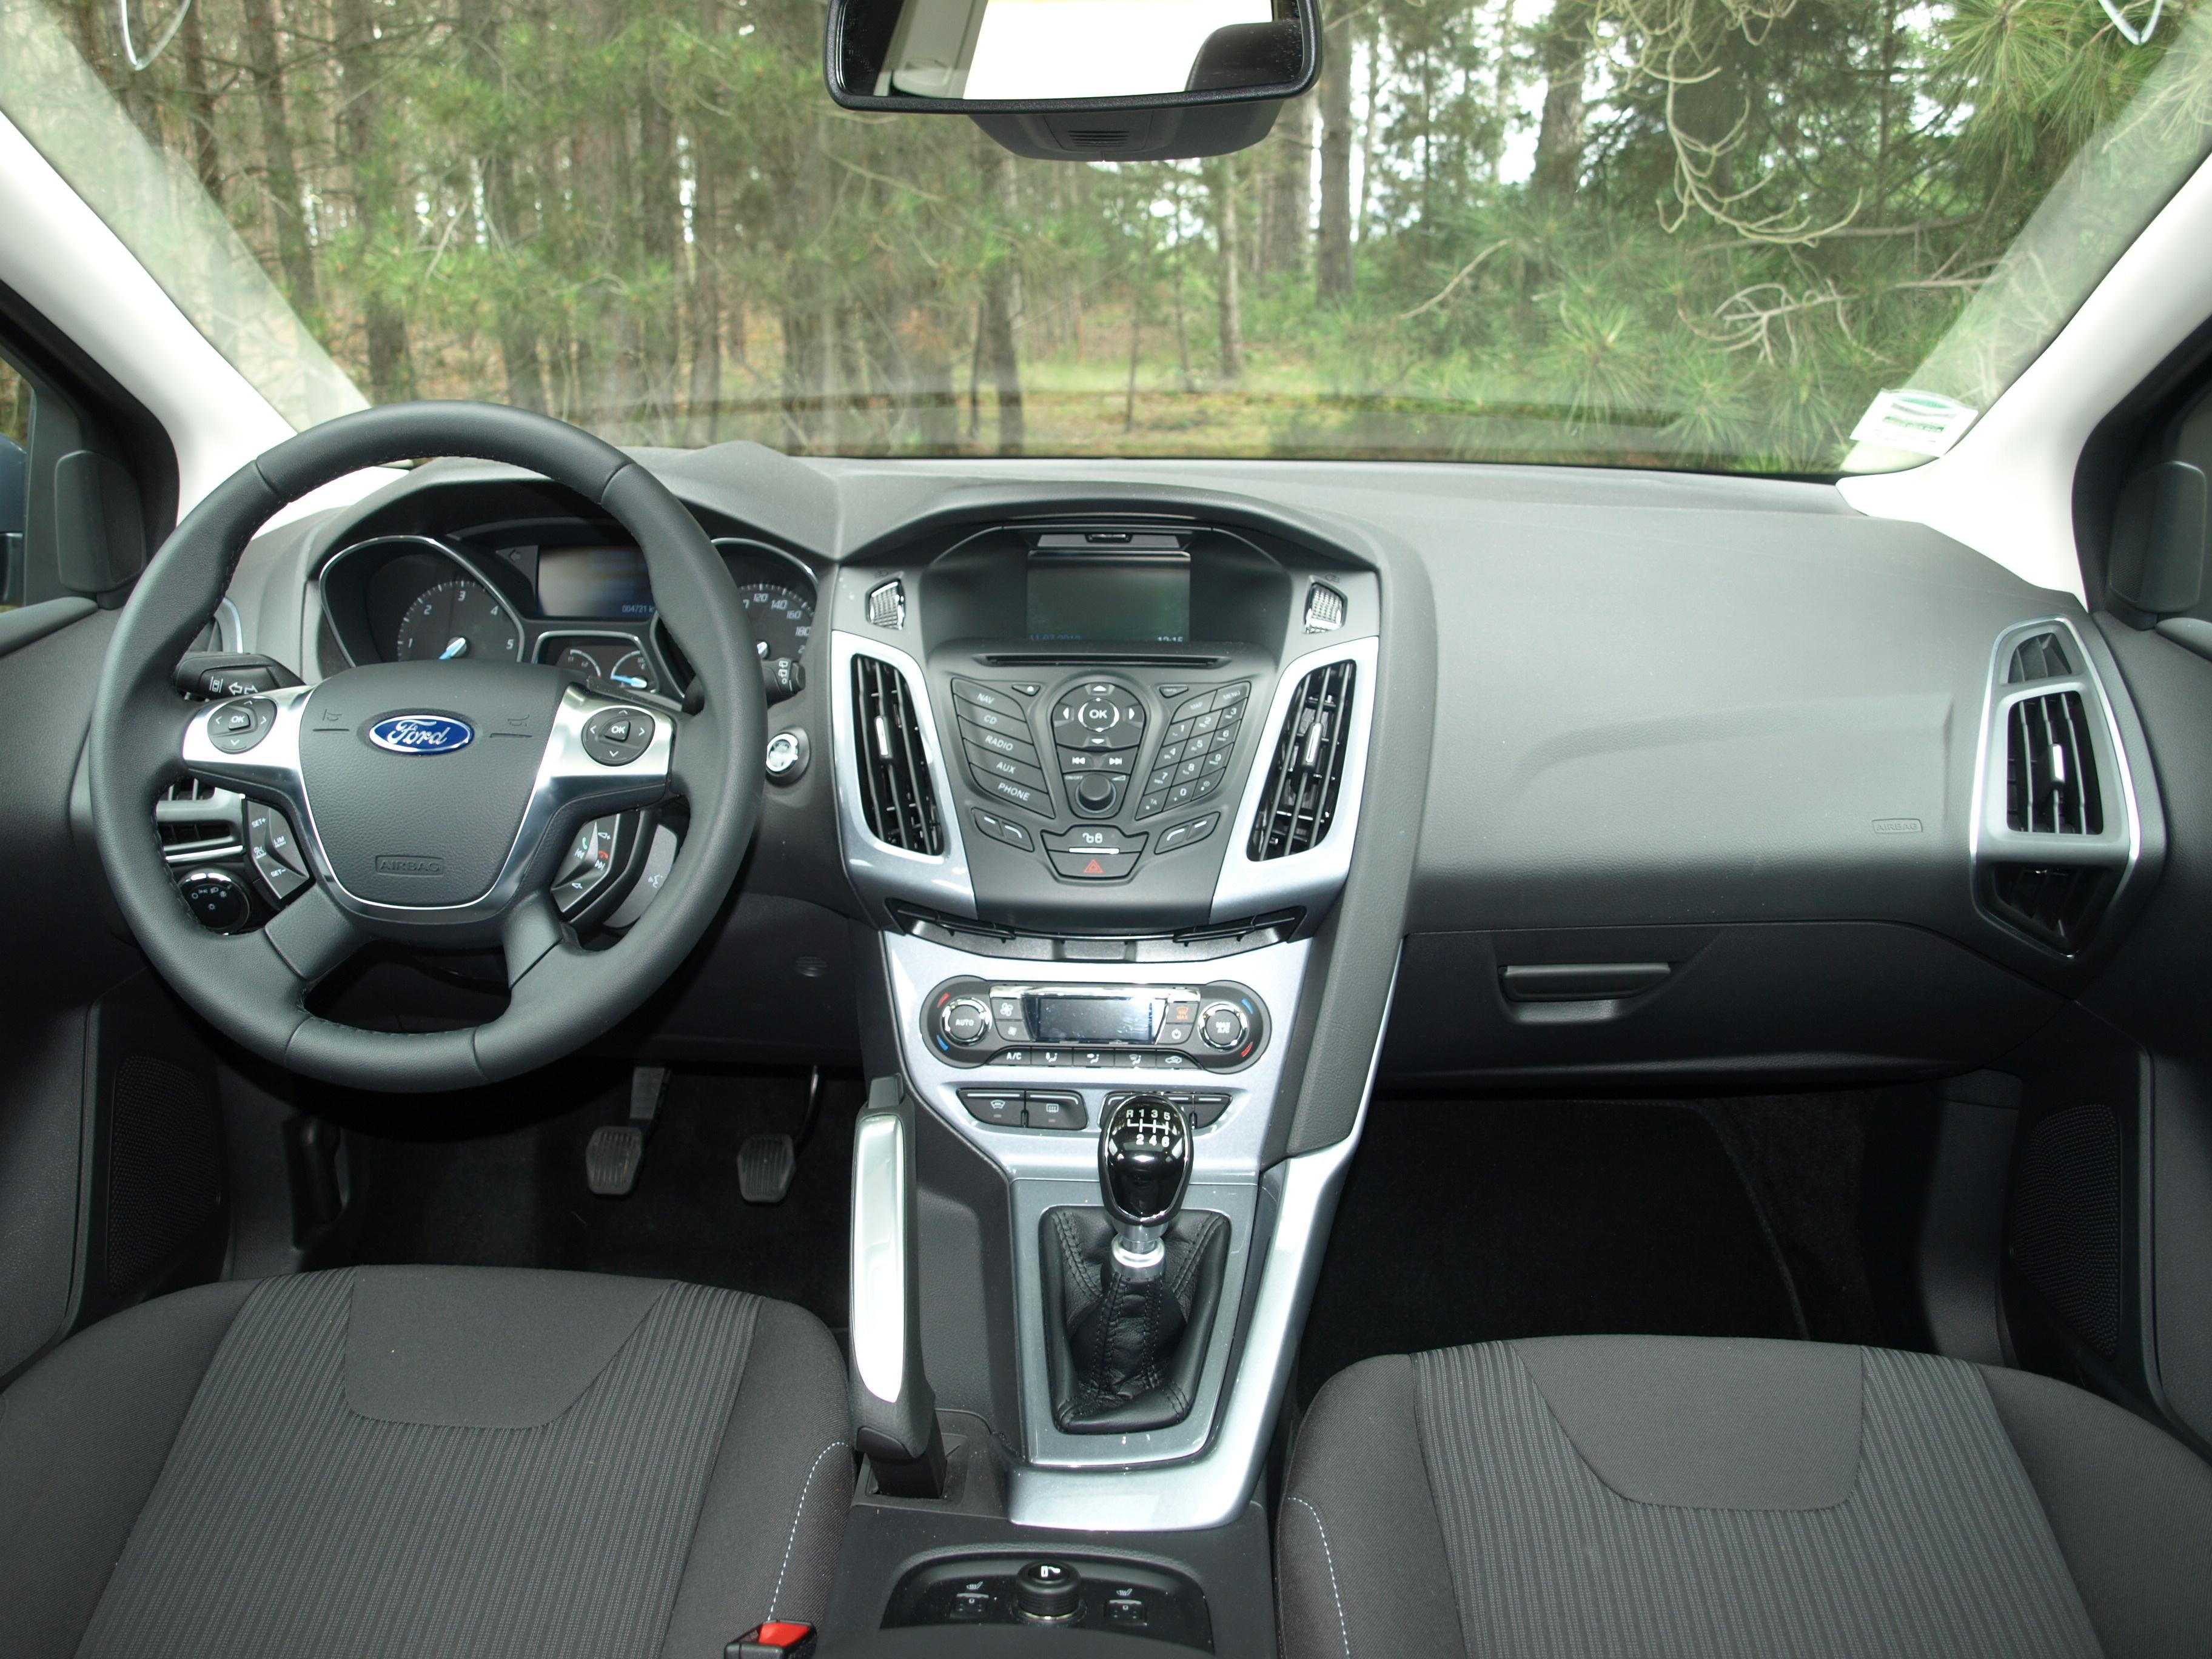 Comparatif Hyundai I30 Vs Ford Focus Bousculer Les Codes